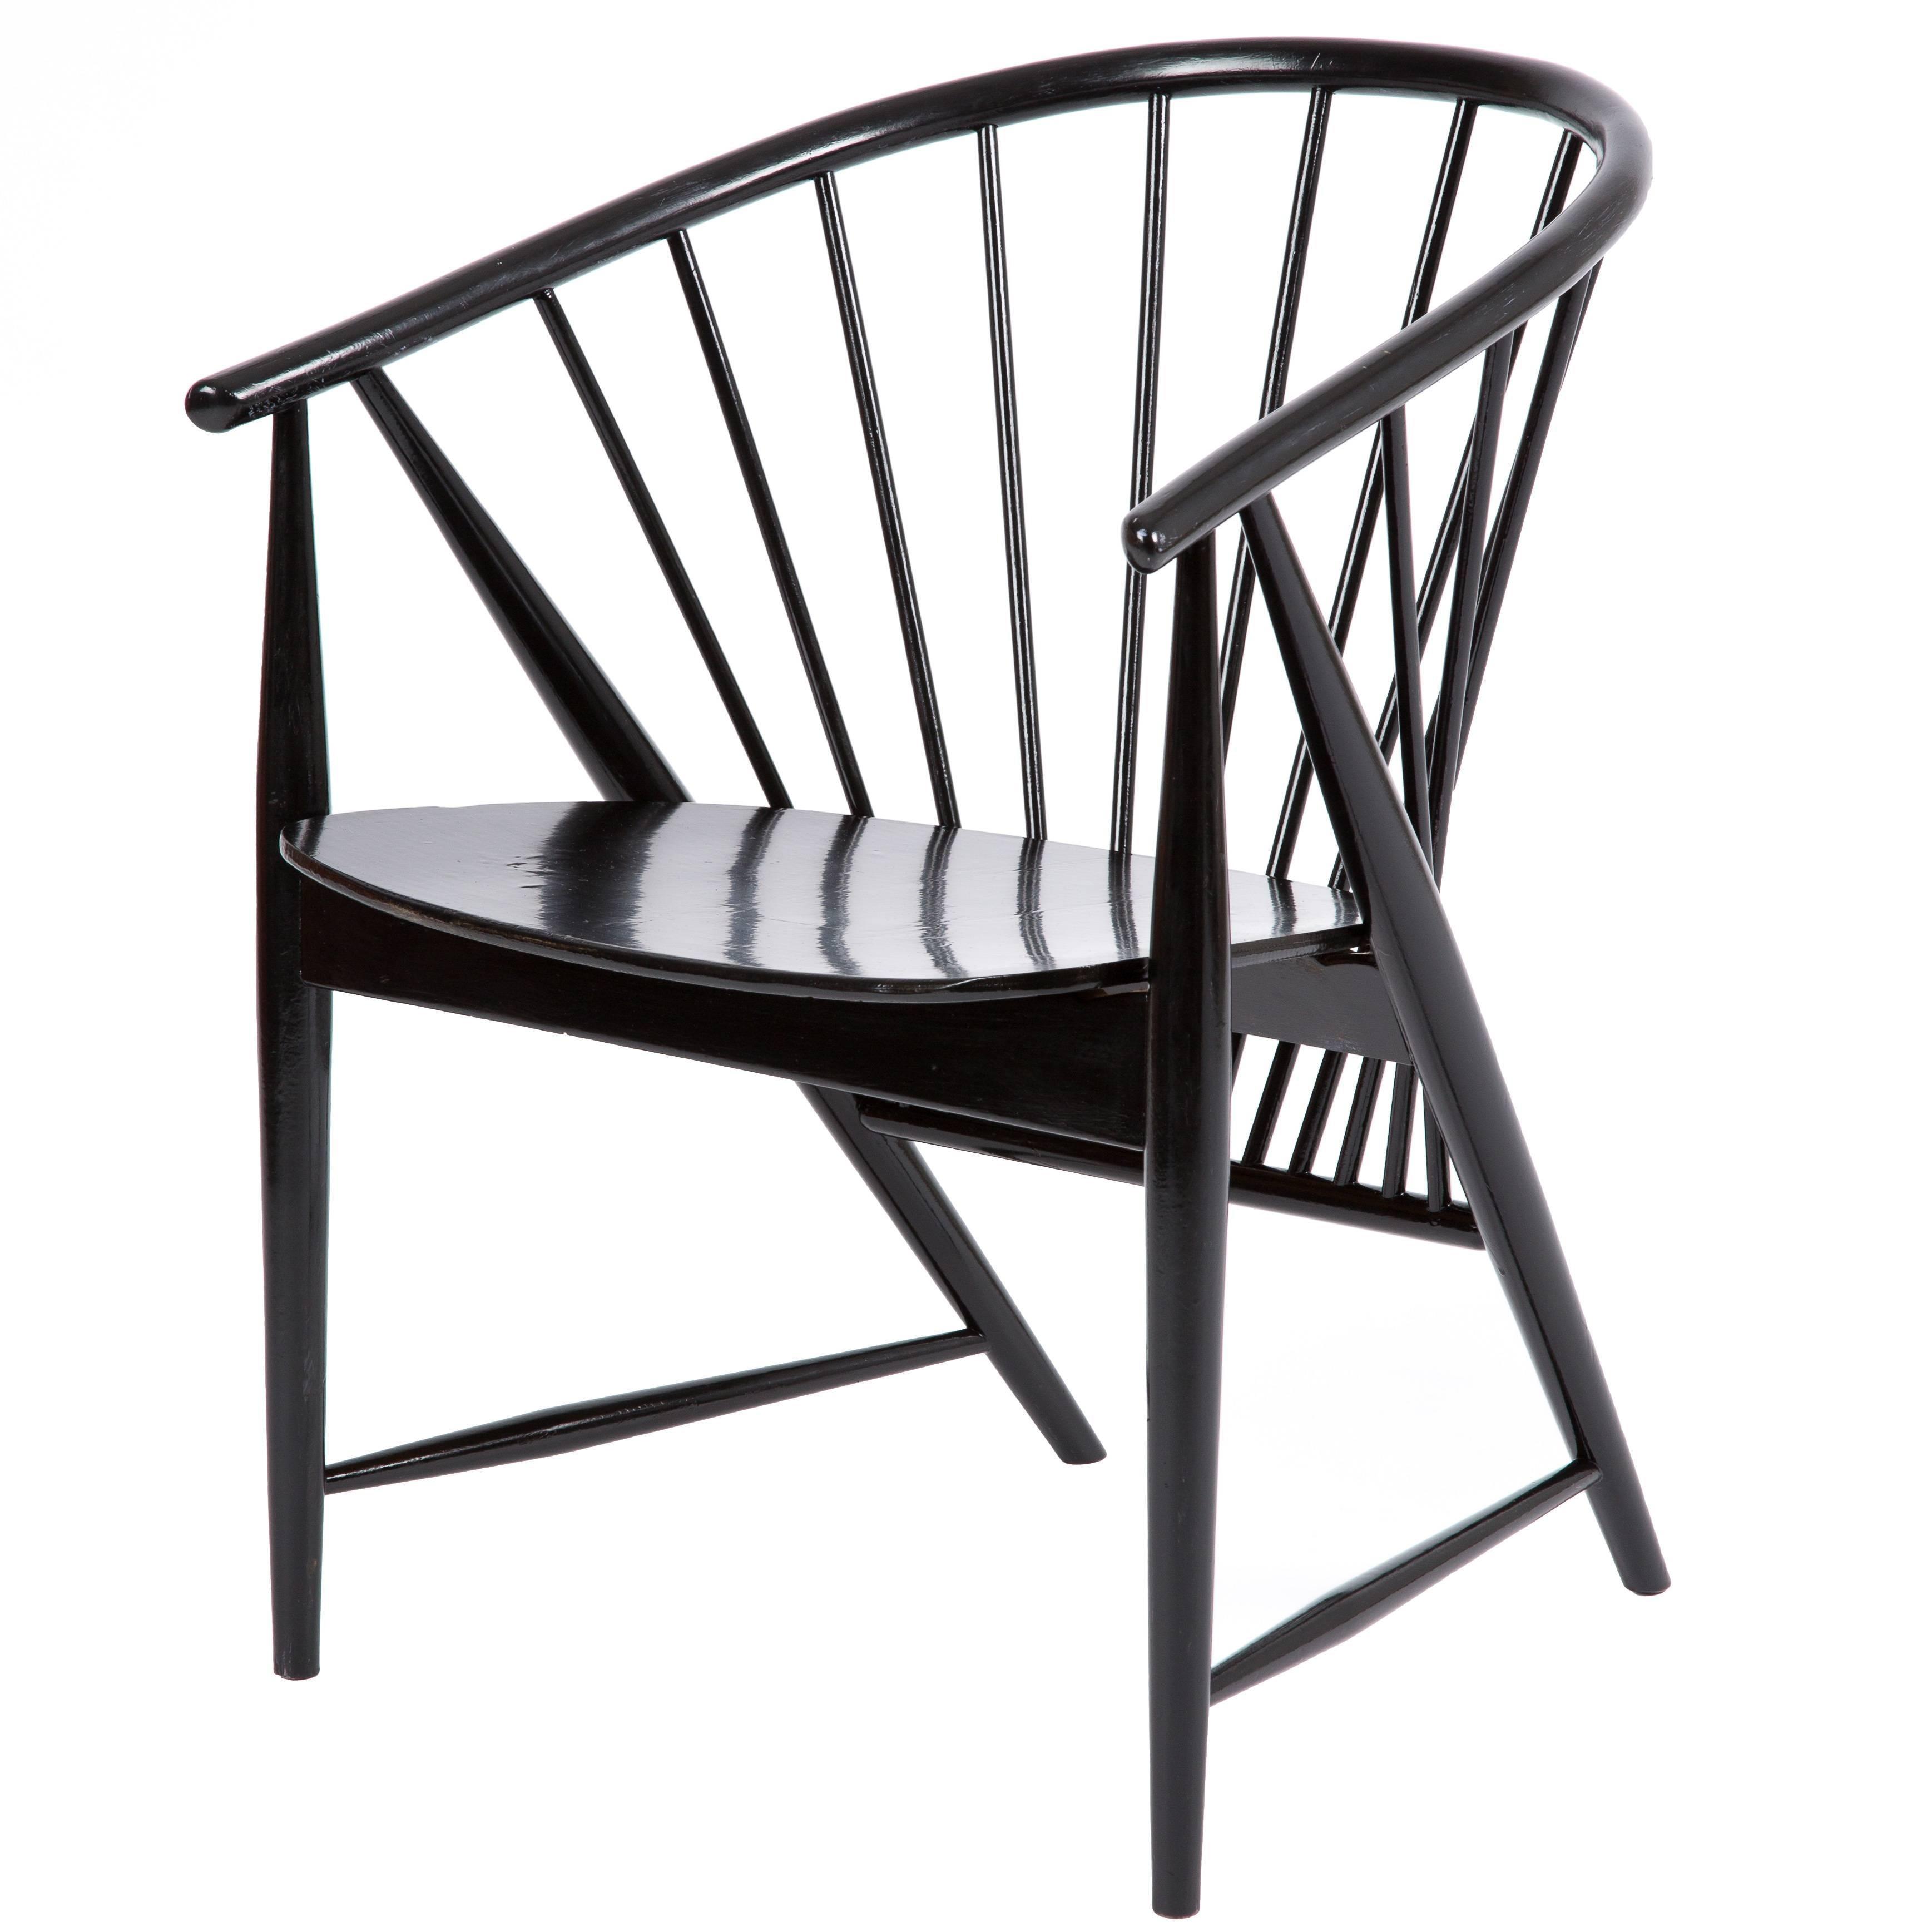 gerrit thomas rietveld furniture 23 for sale at 1stdibs Retro 50s Bedroom Furniture